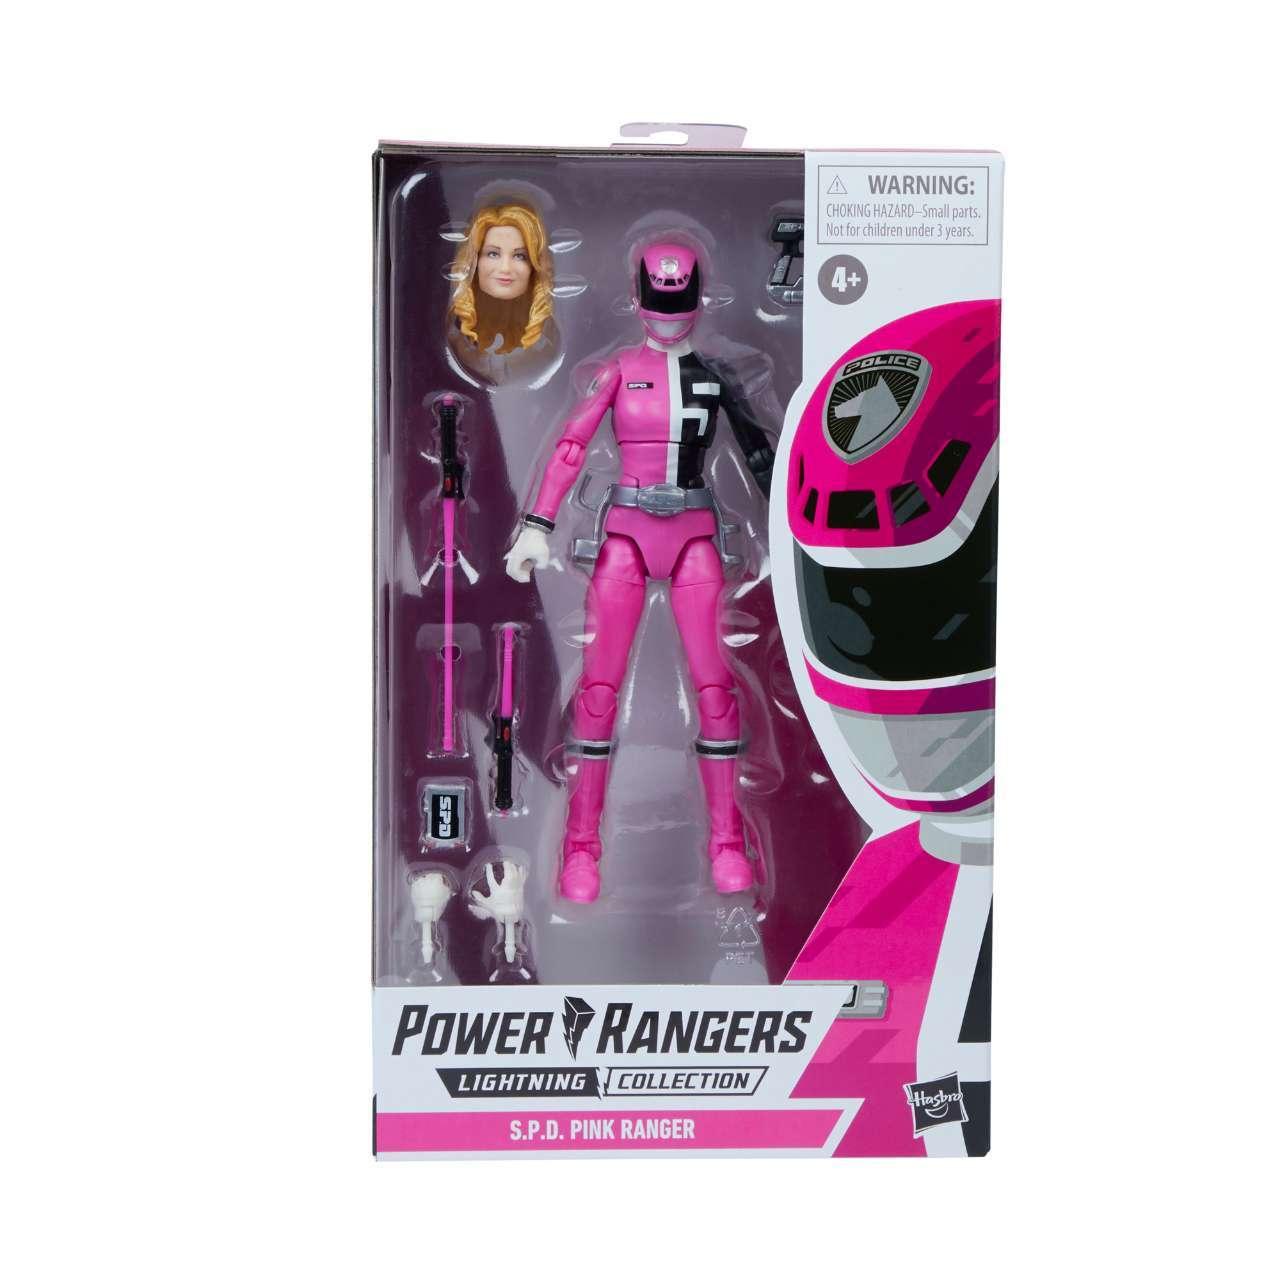 power-rangers-lightning-collection-F1428_PROD_PRG_BLT_RAD_NEPTUNE_62A5468_Online_300DPI